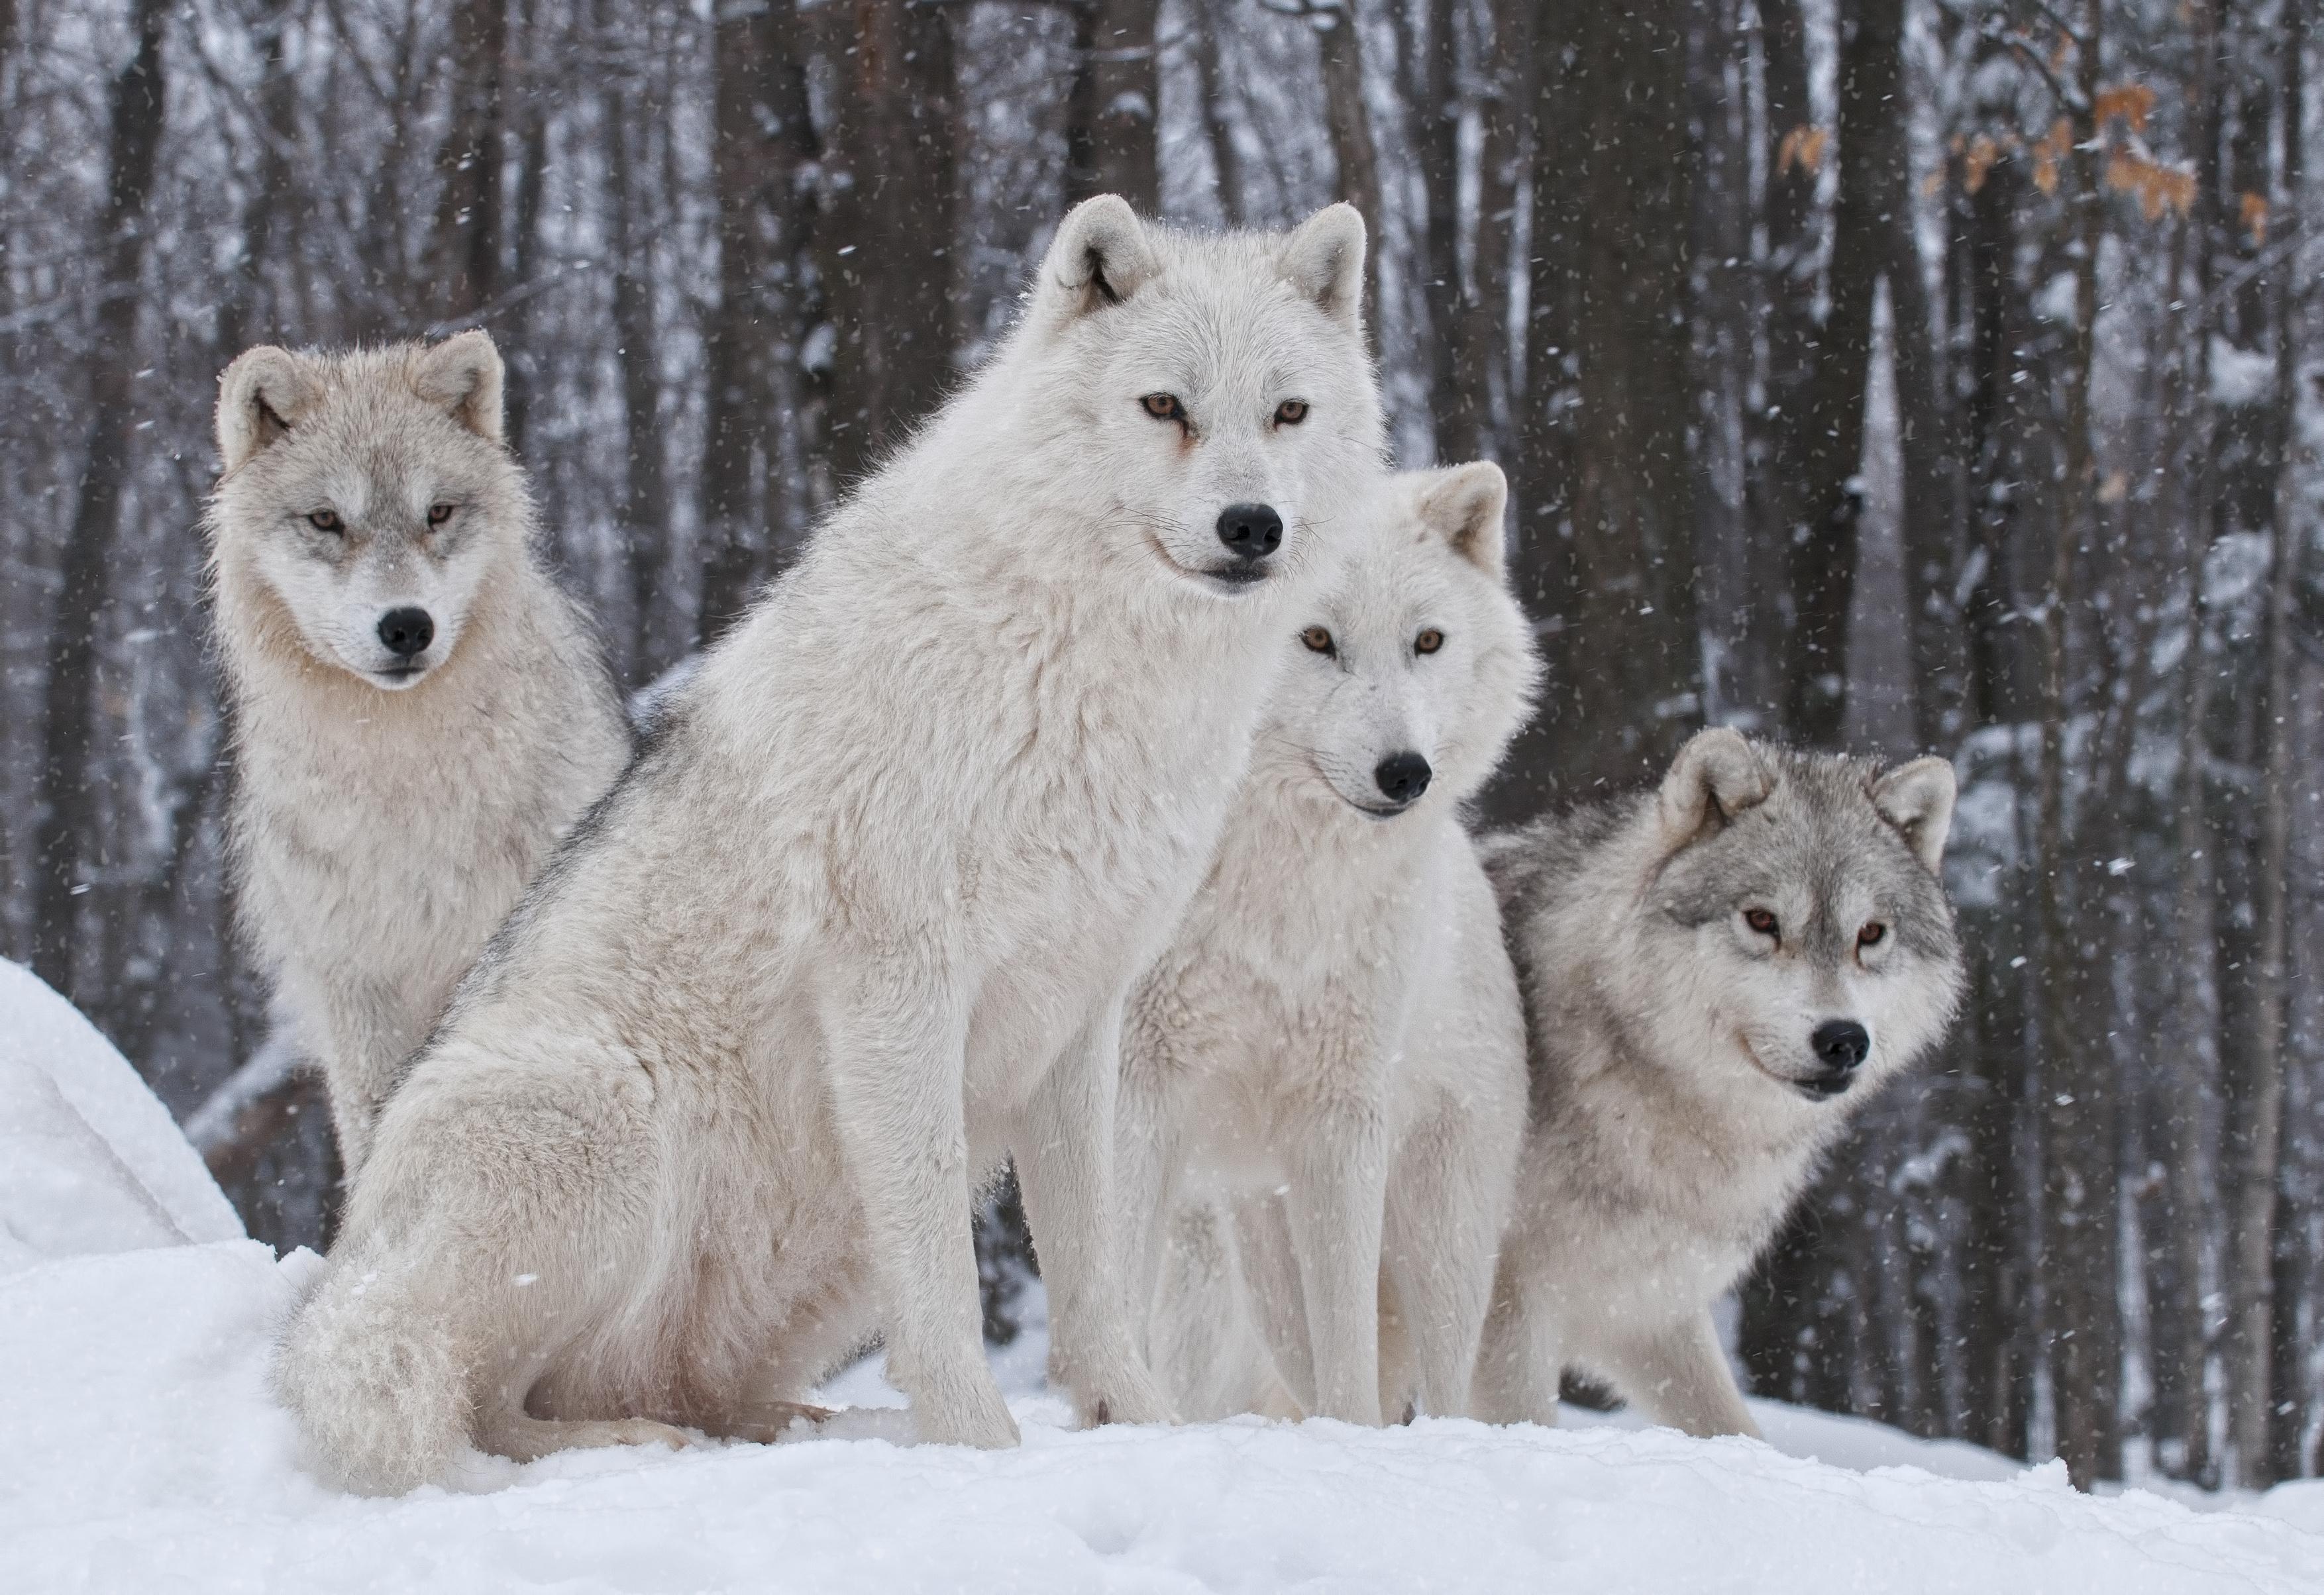 Wildlife Winter Wolf Predator Animal 3508x2408